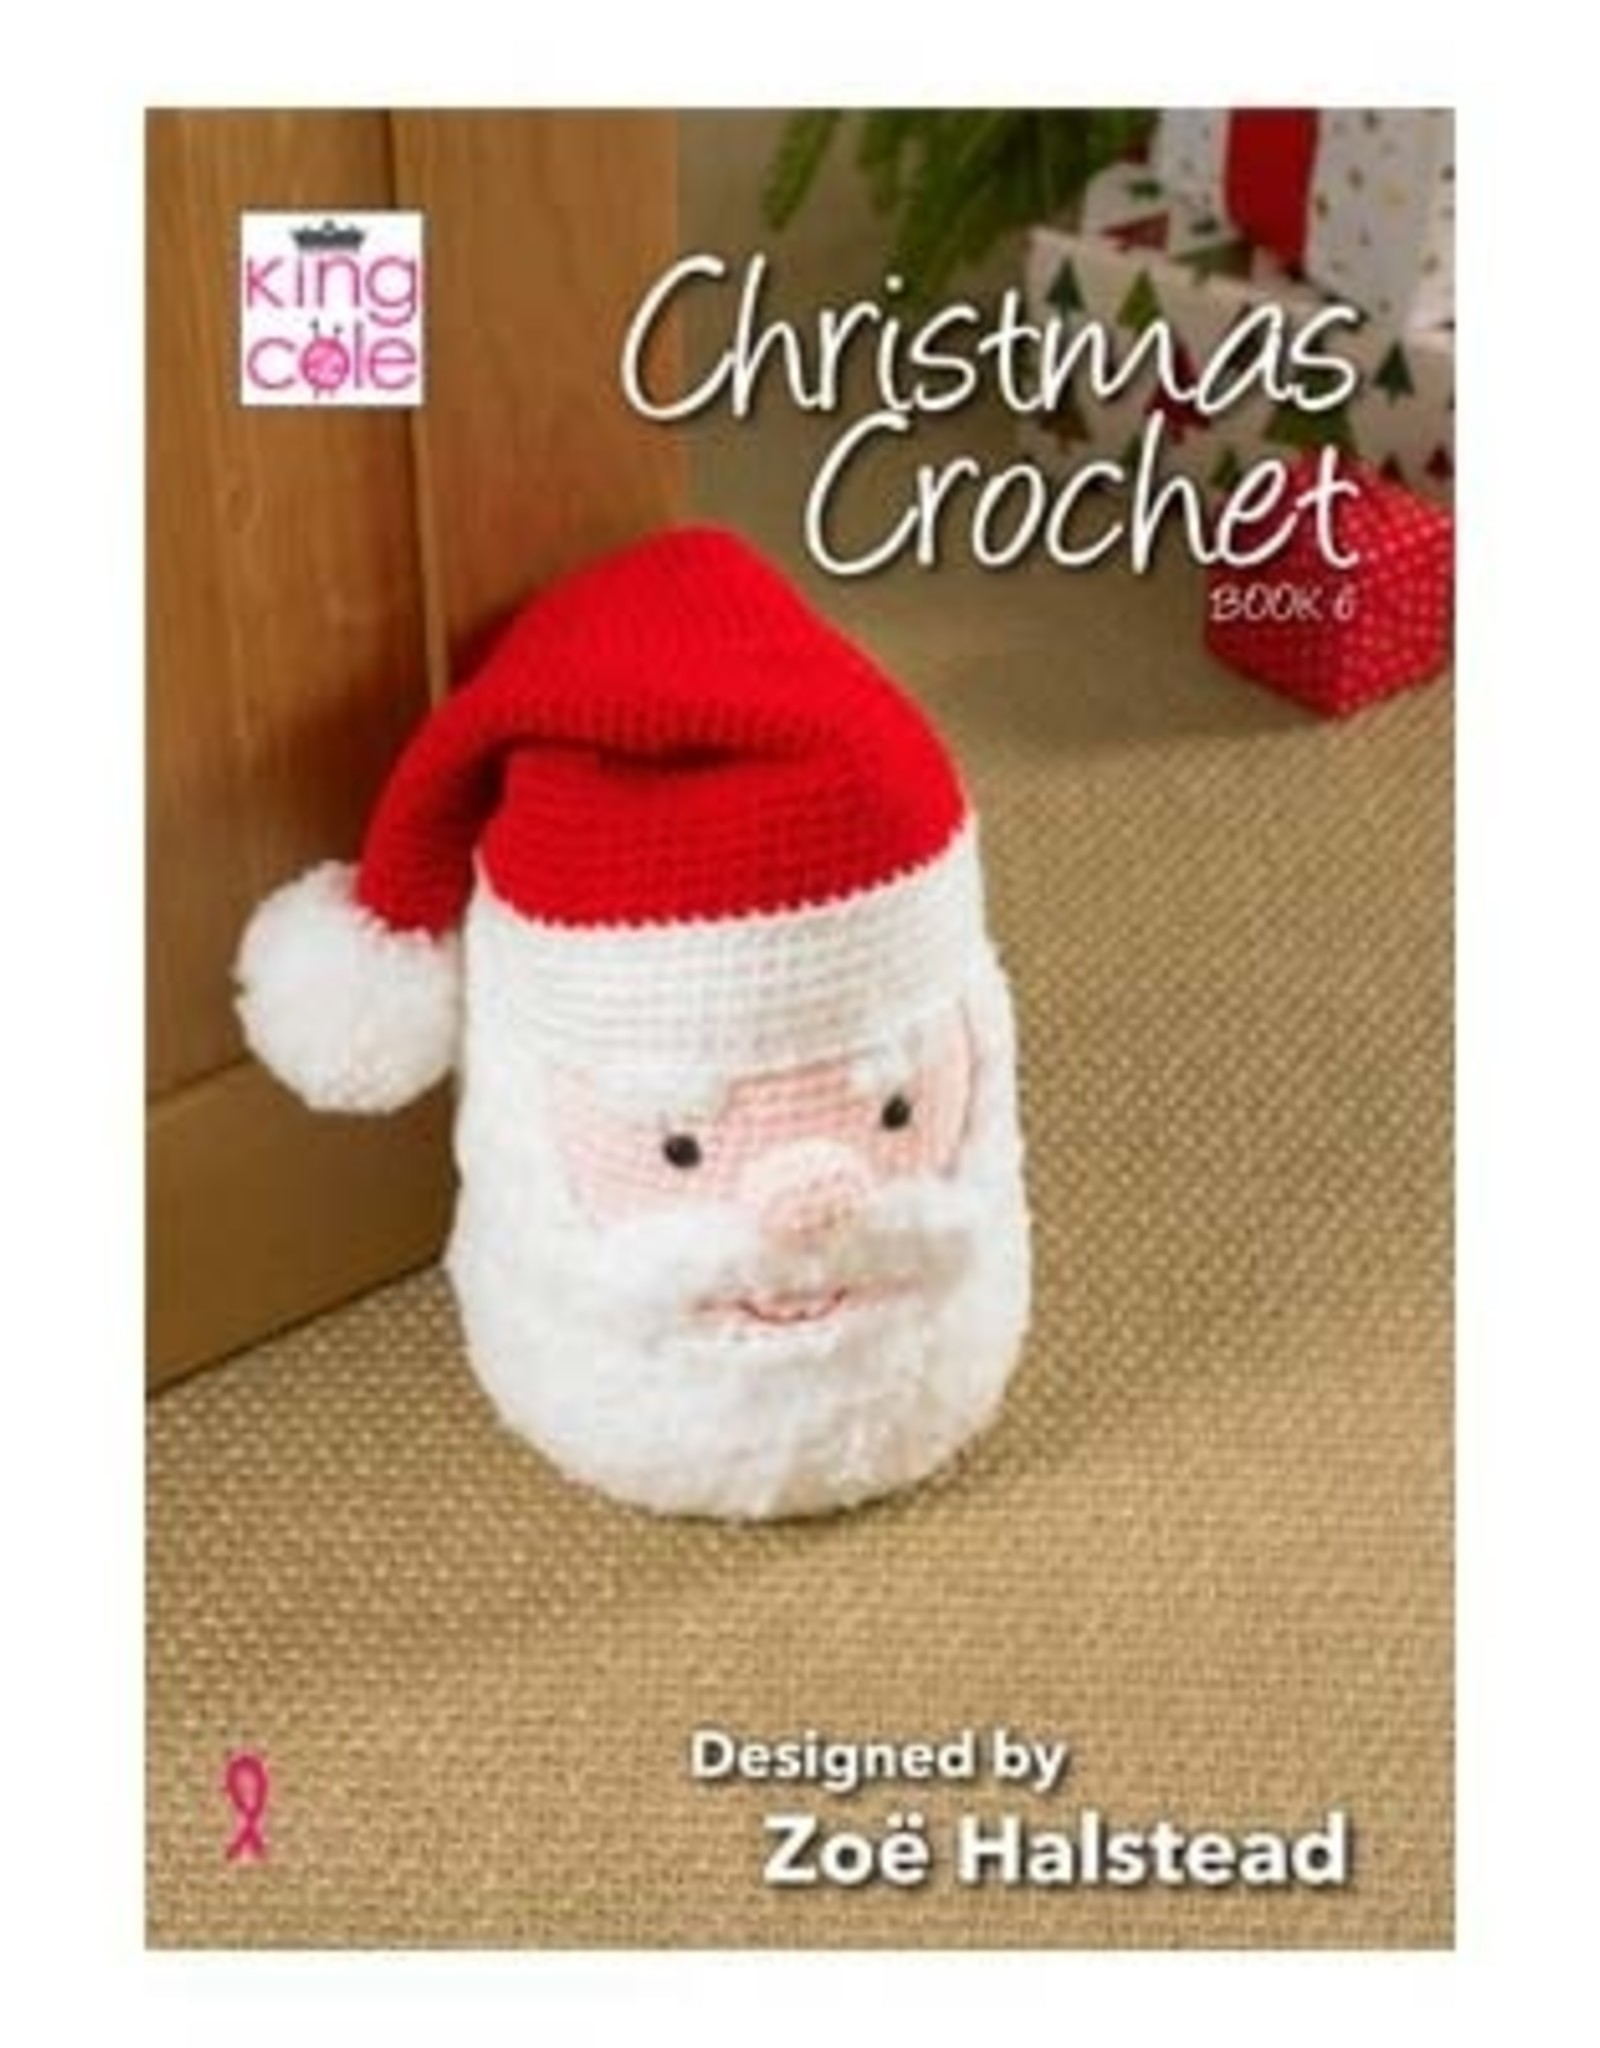 Christmas Crochet - Book 6